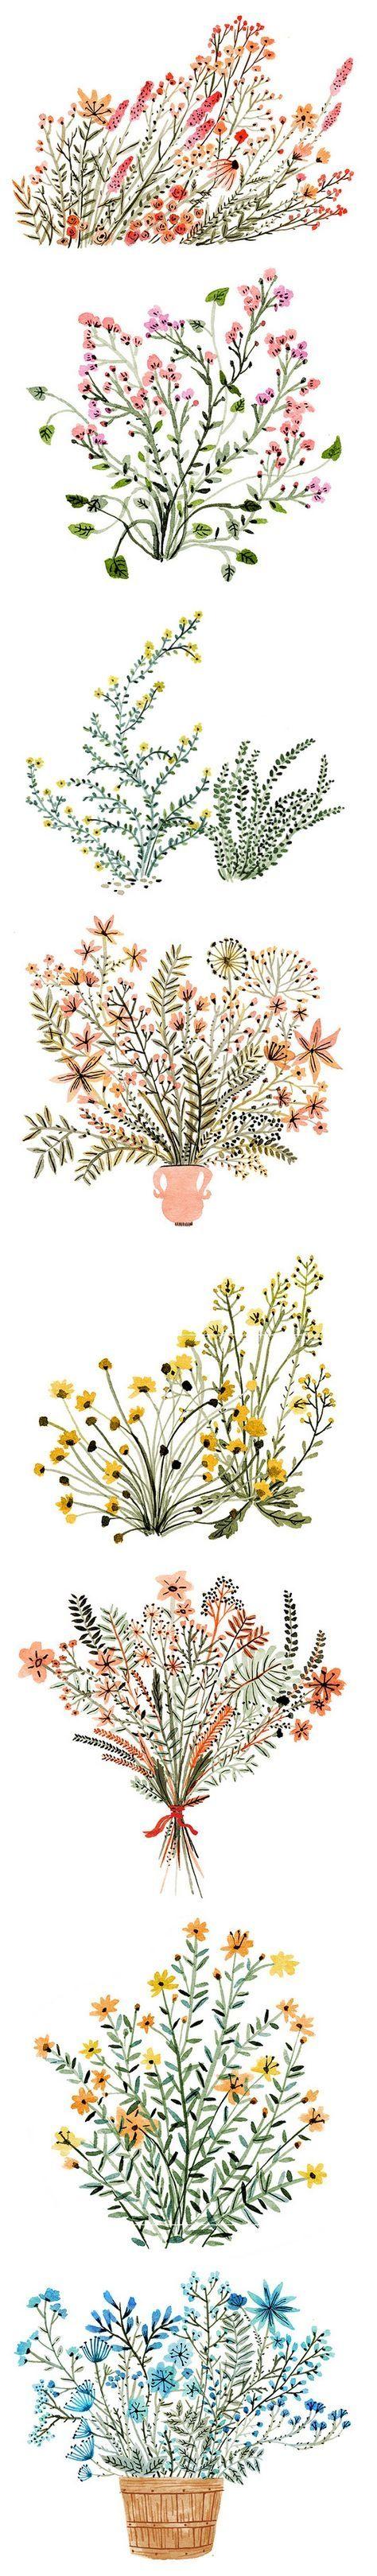 Dainty watercolor flowers, by Vikki Chu//